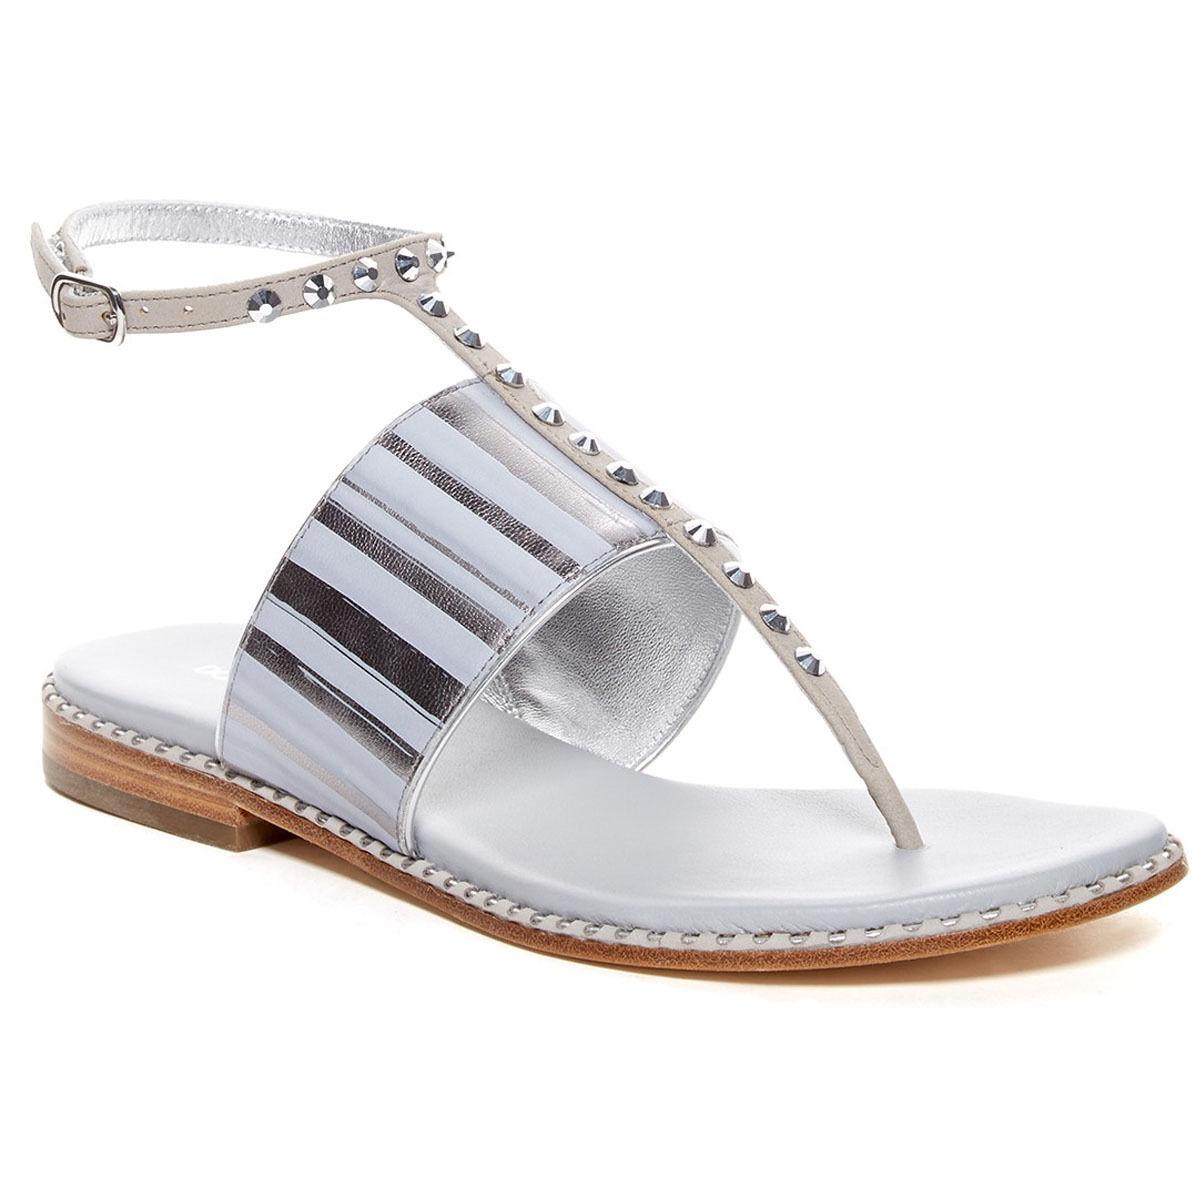 Donald J Pliner Donna Lacysp T-Strap Slip On Open Toe Studded Thong Sandals